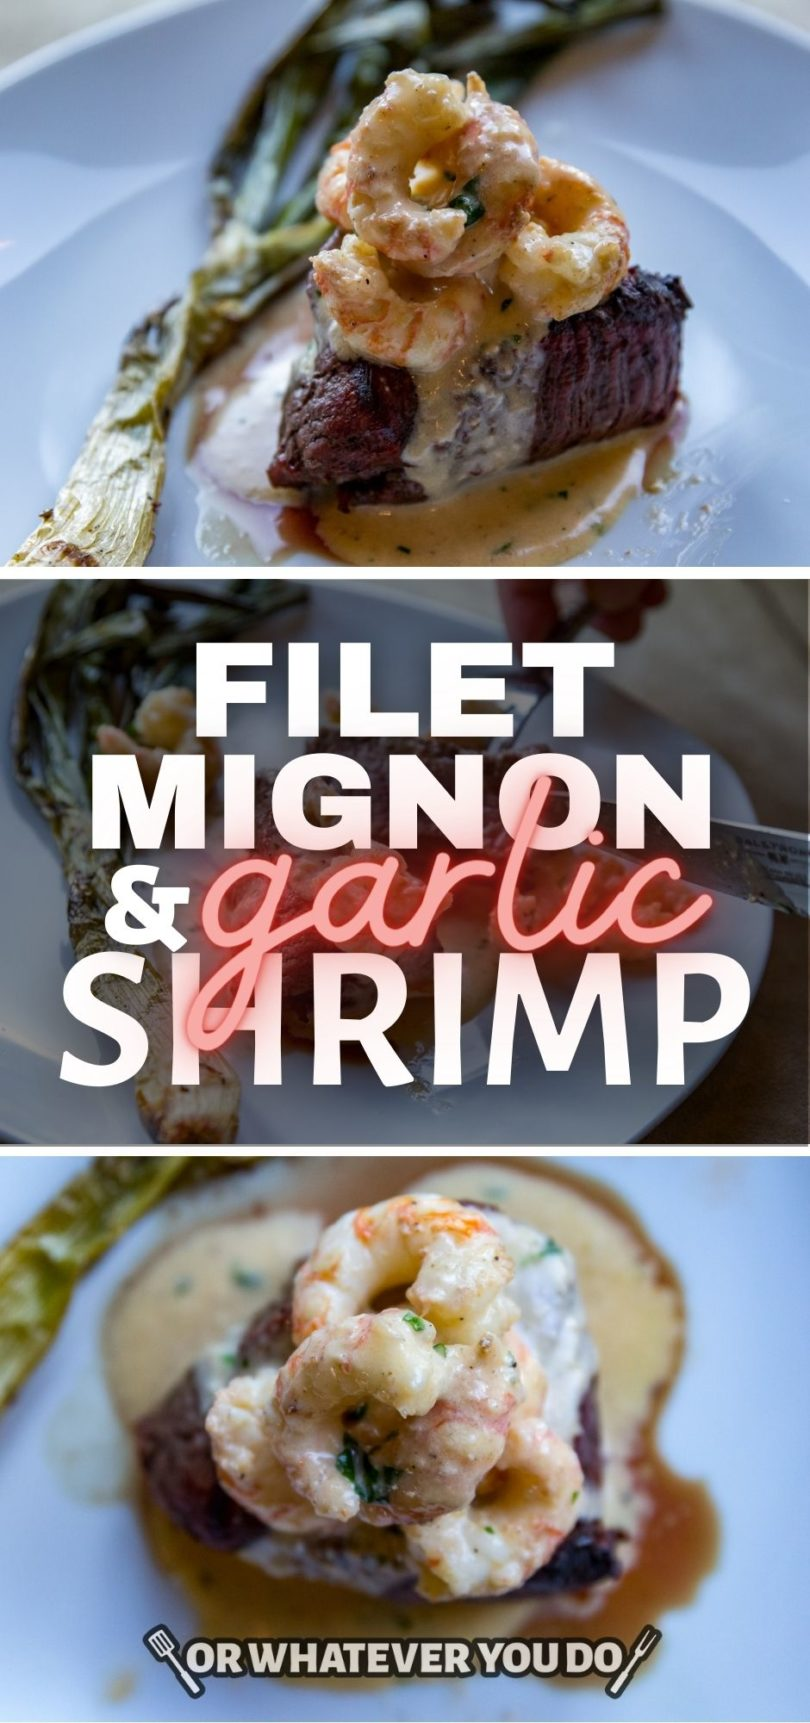 ButcherBox Filet Mignon with Creamy Shrimp Sauce